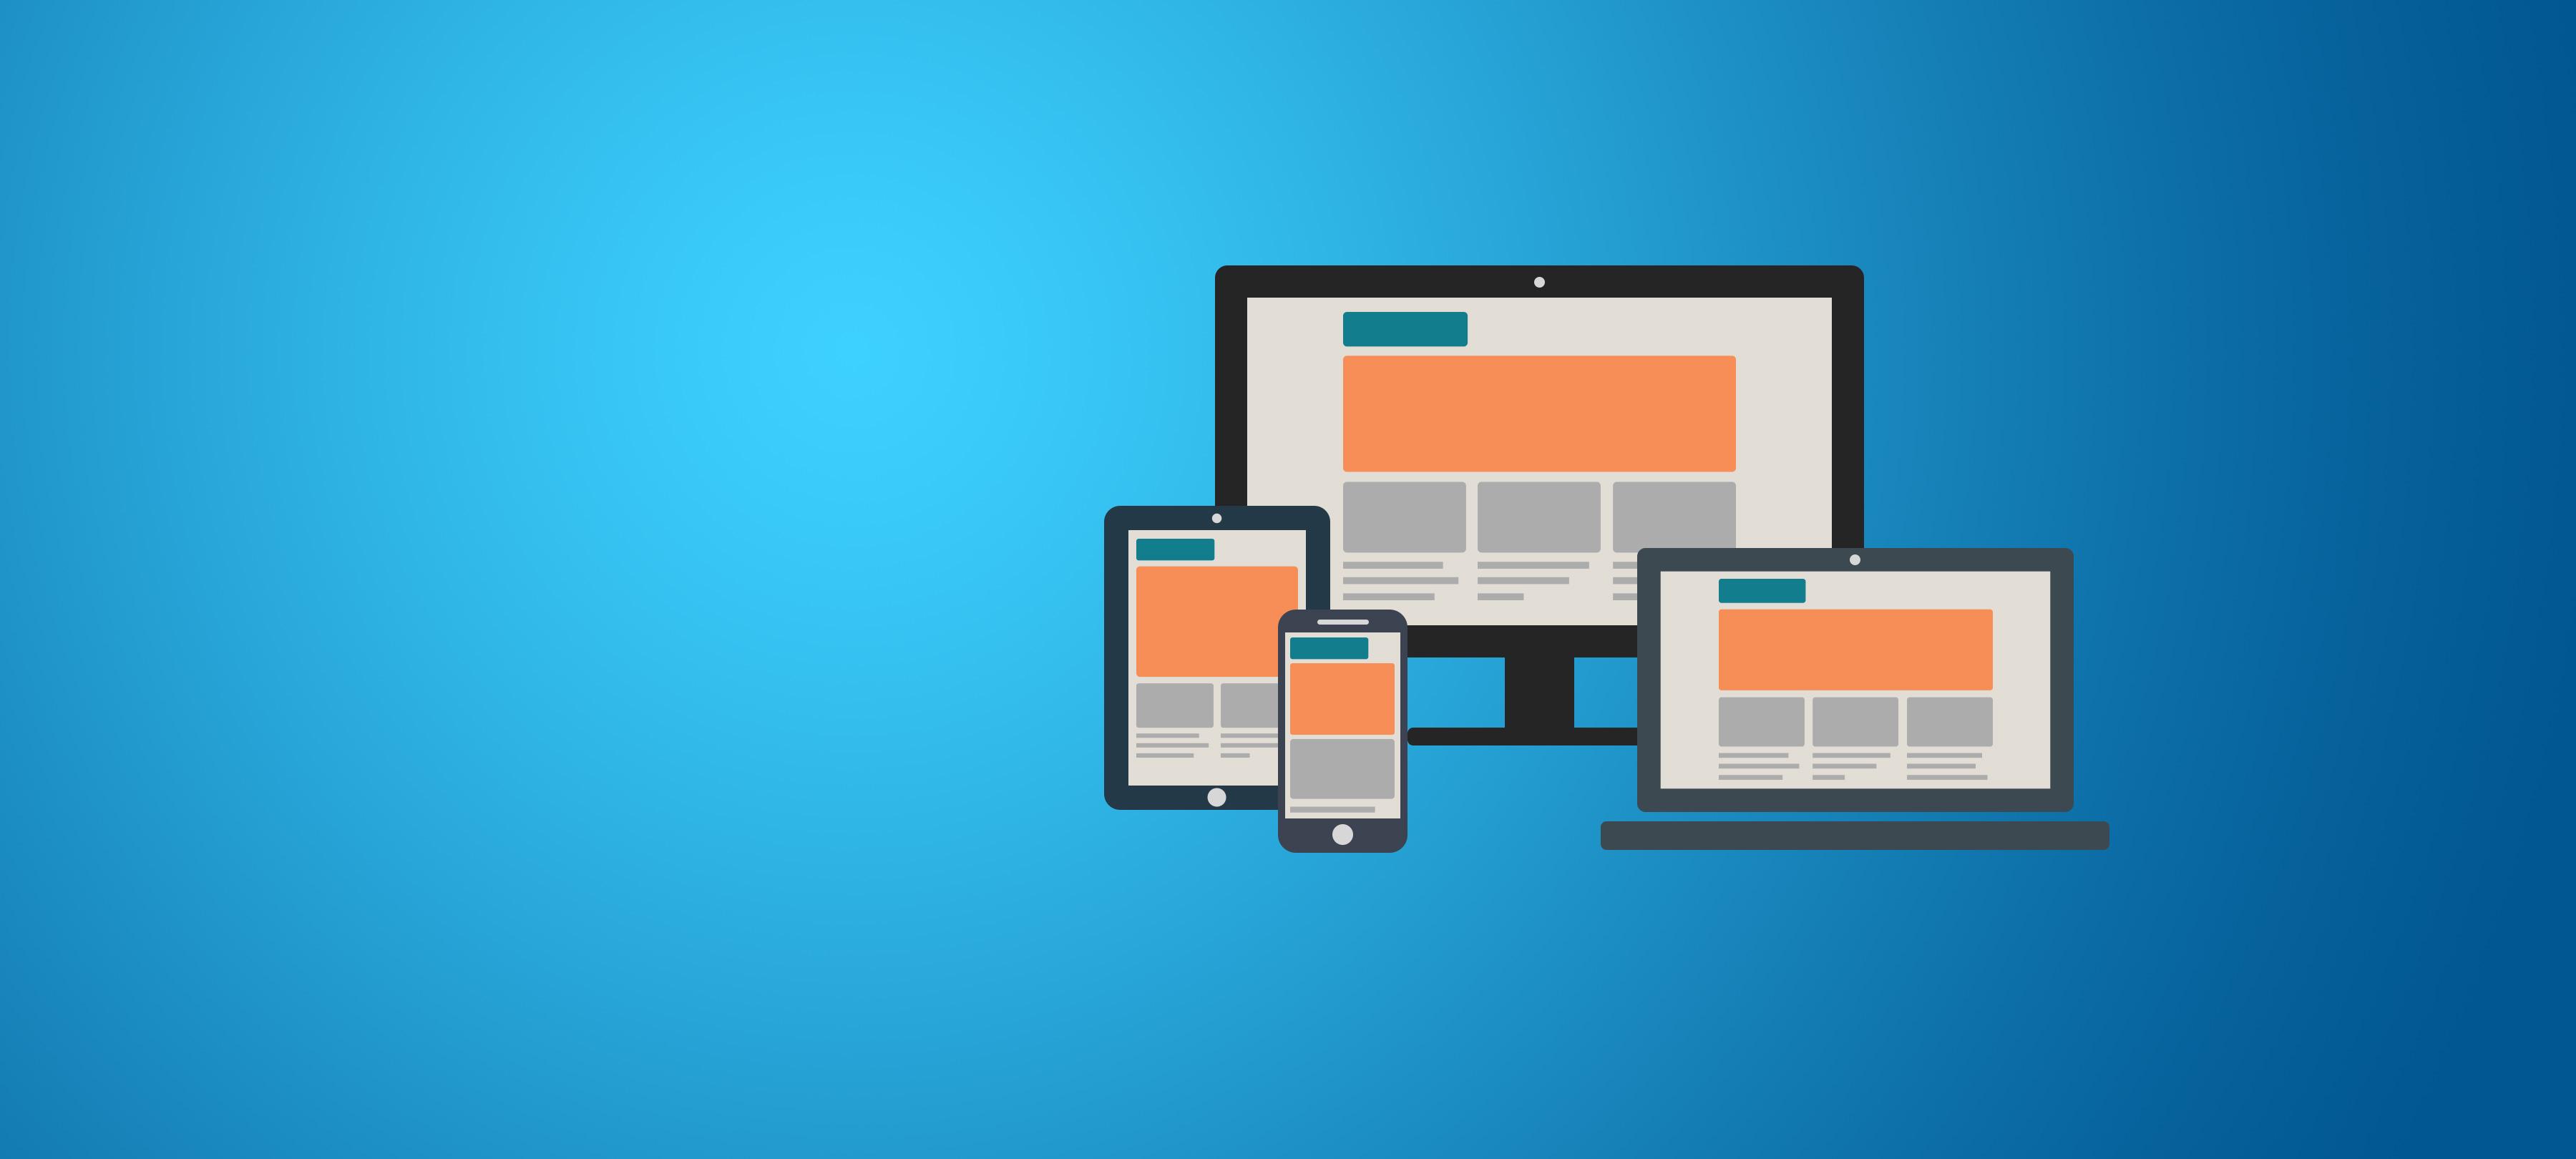 Cross-Device Compatible Web Design